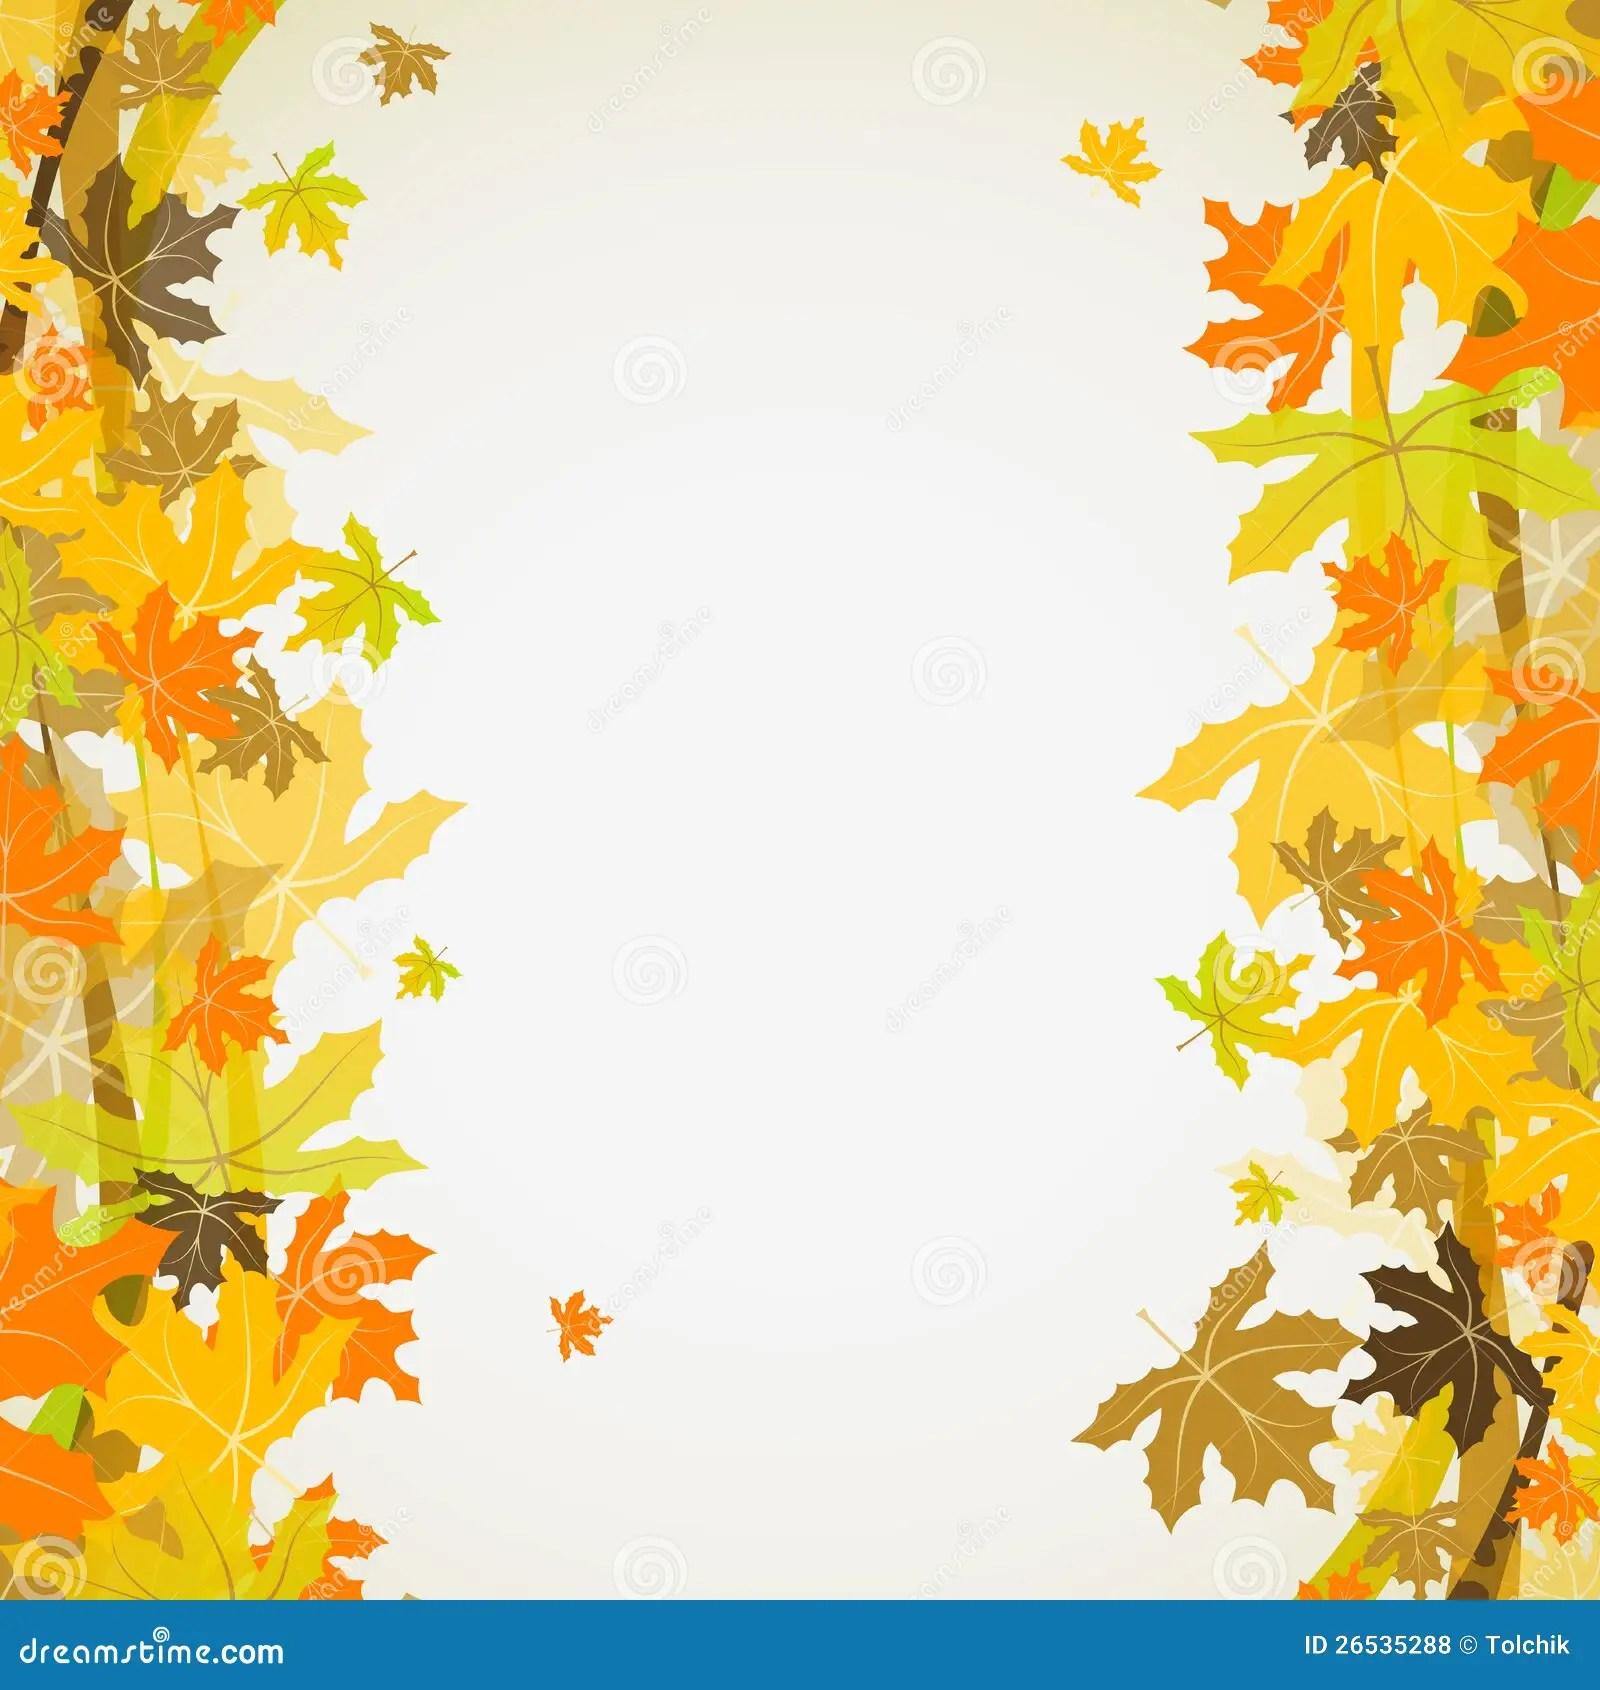 hight resolution of maple autumn background vector